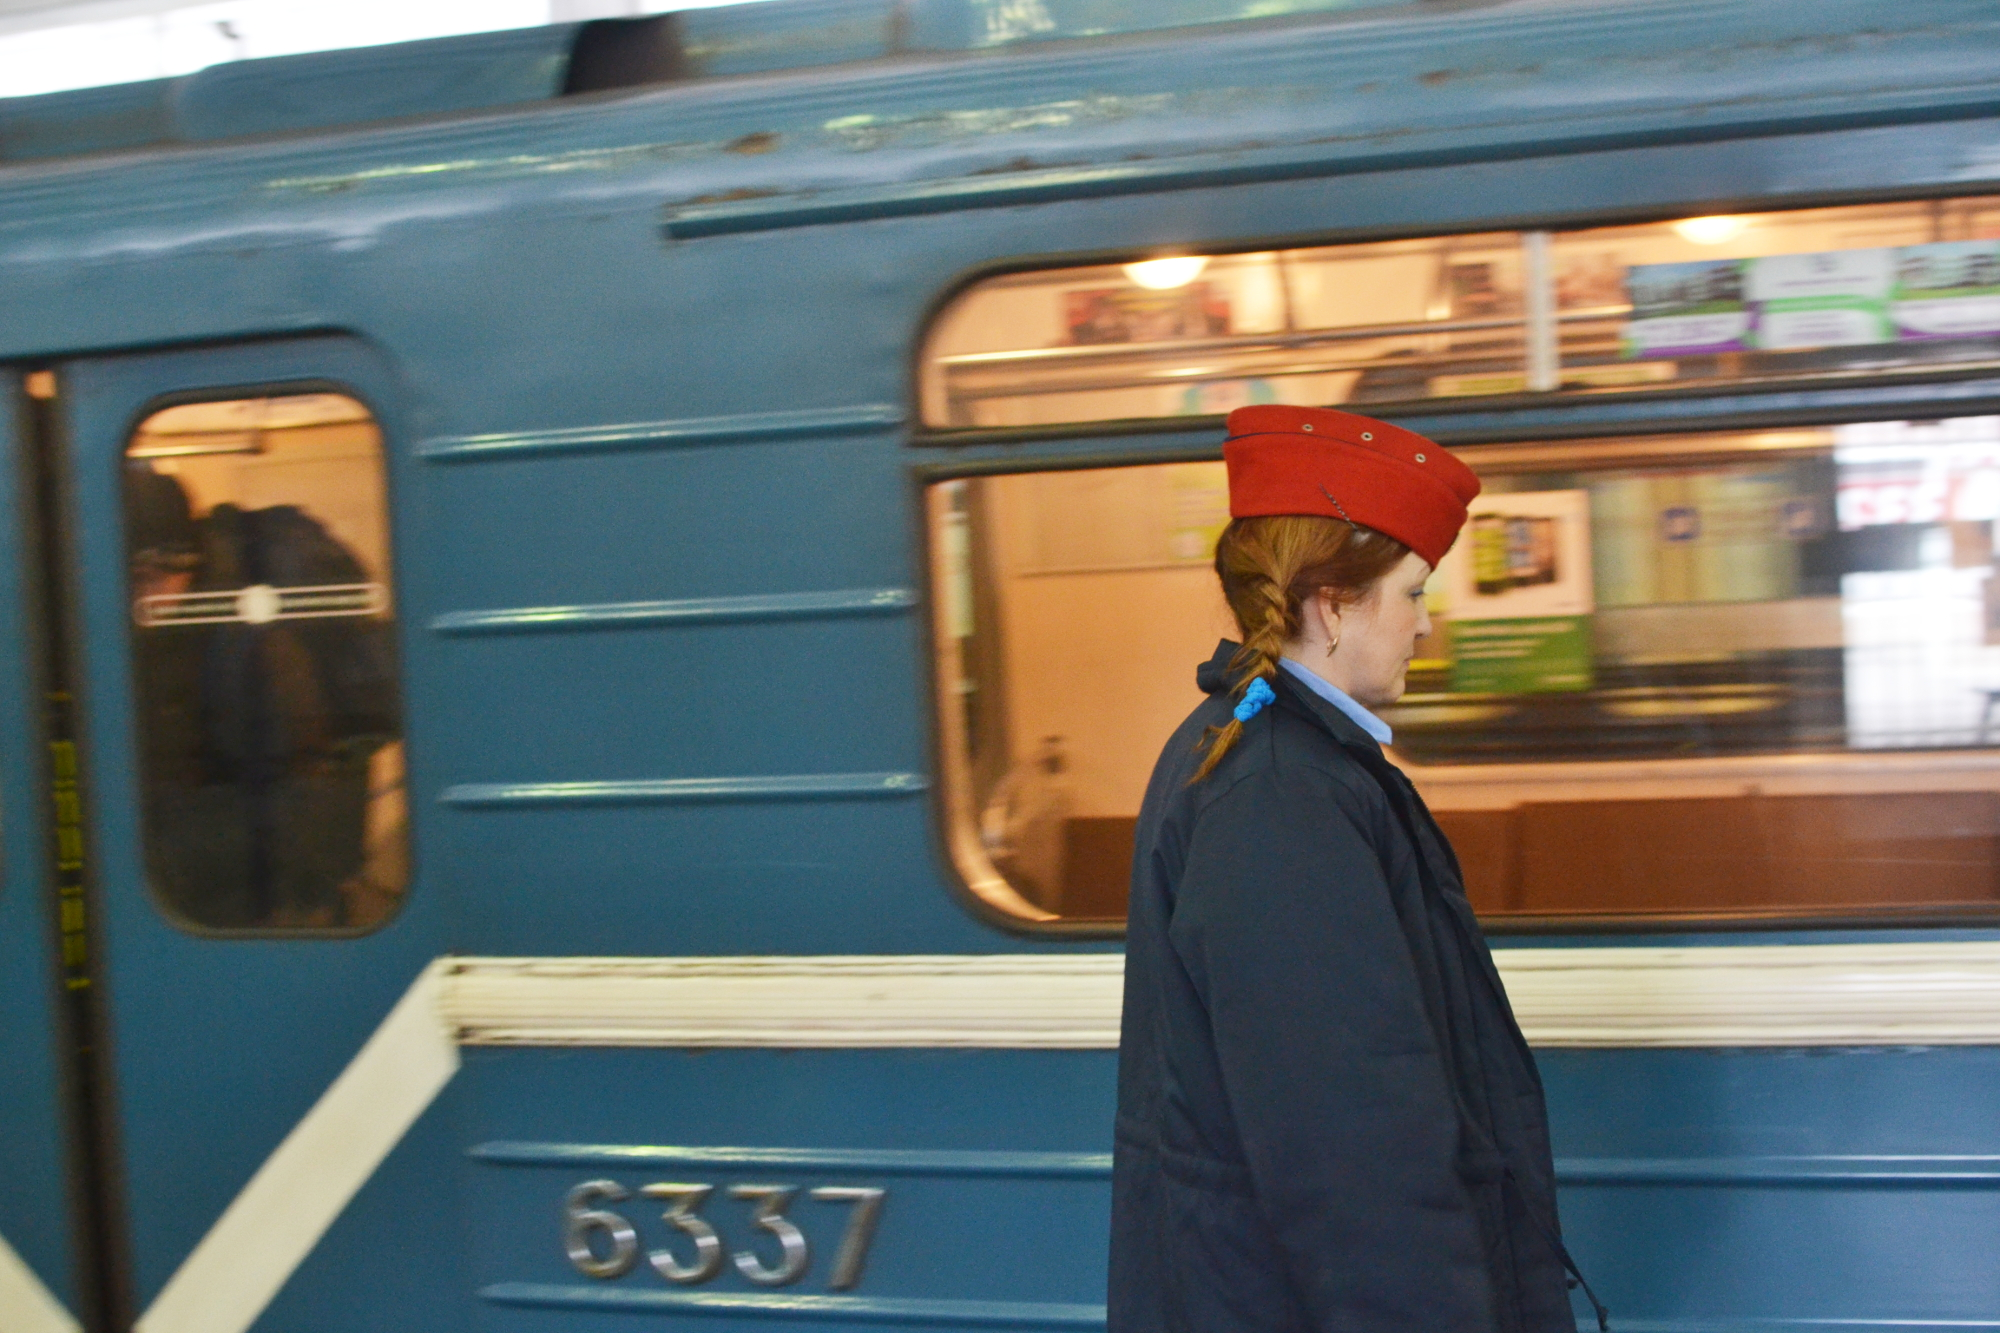 Питерское метро, 2015 год.